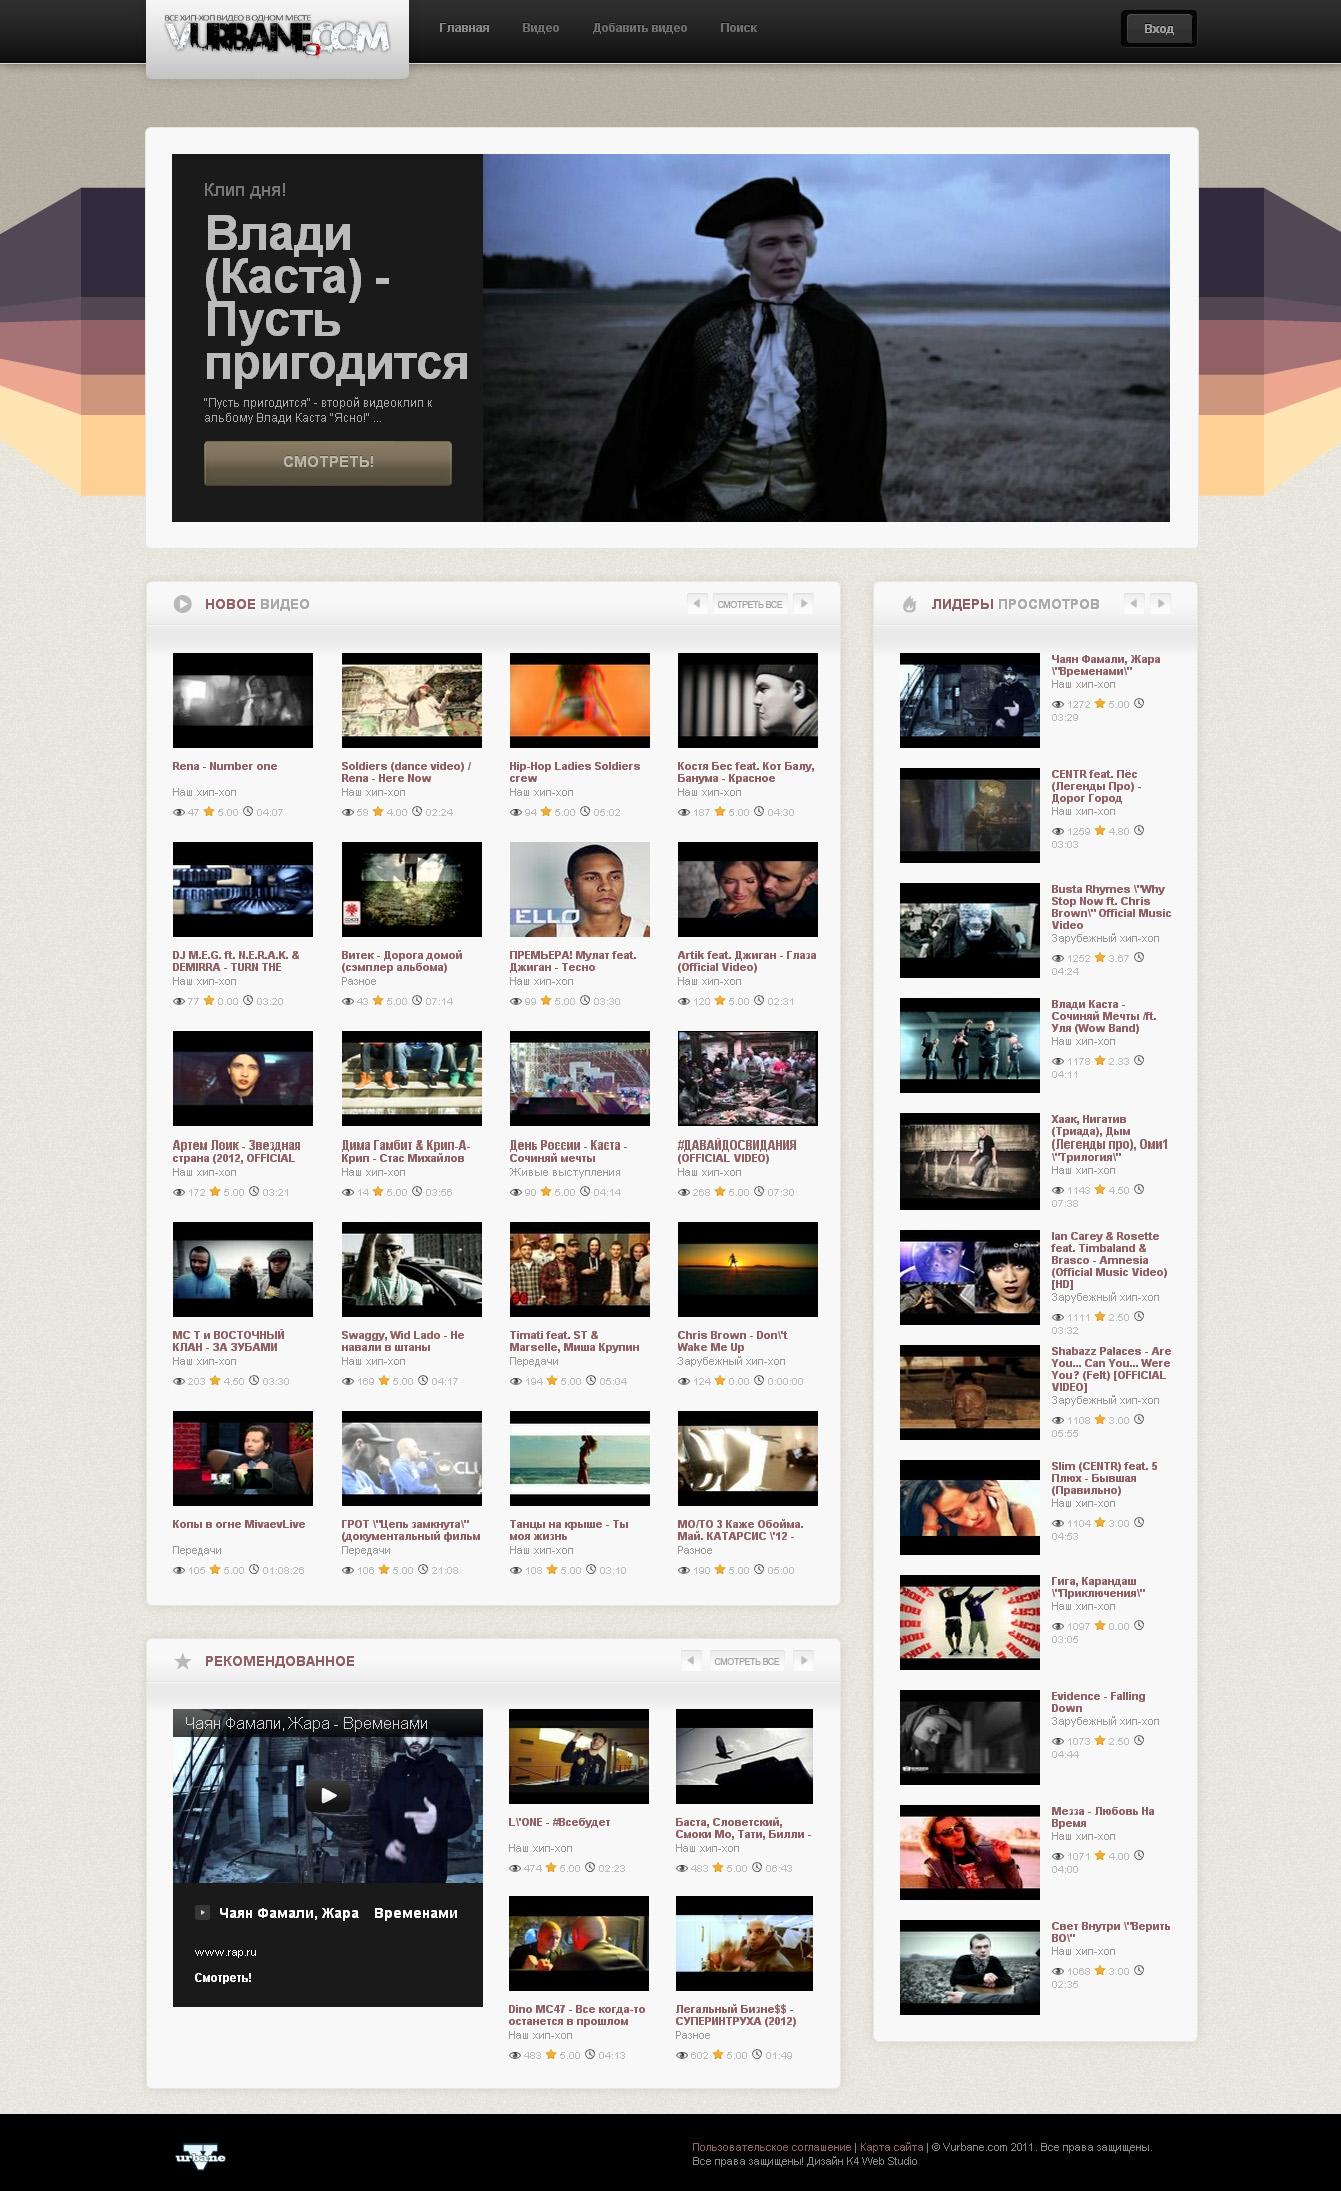 Видеопортал - Vurbane.com